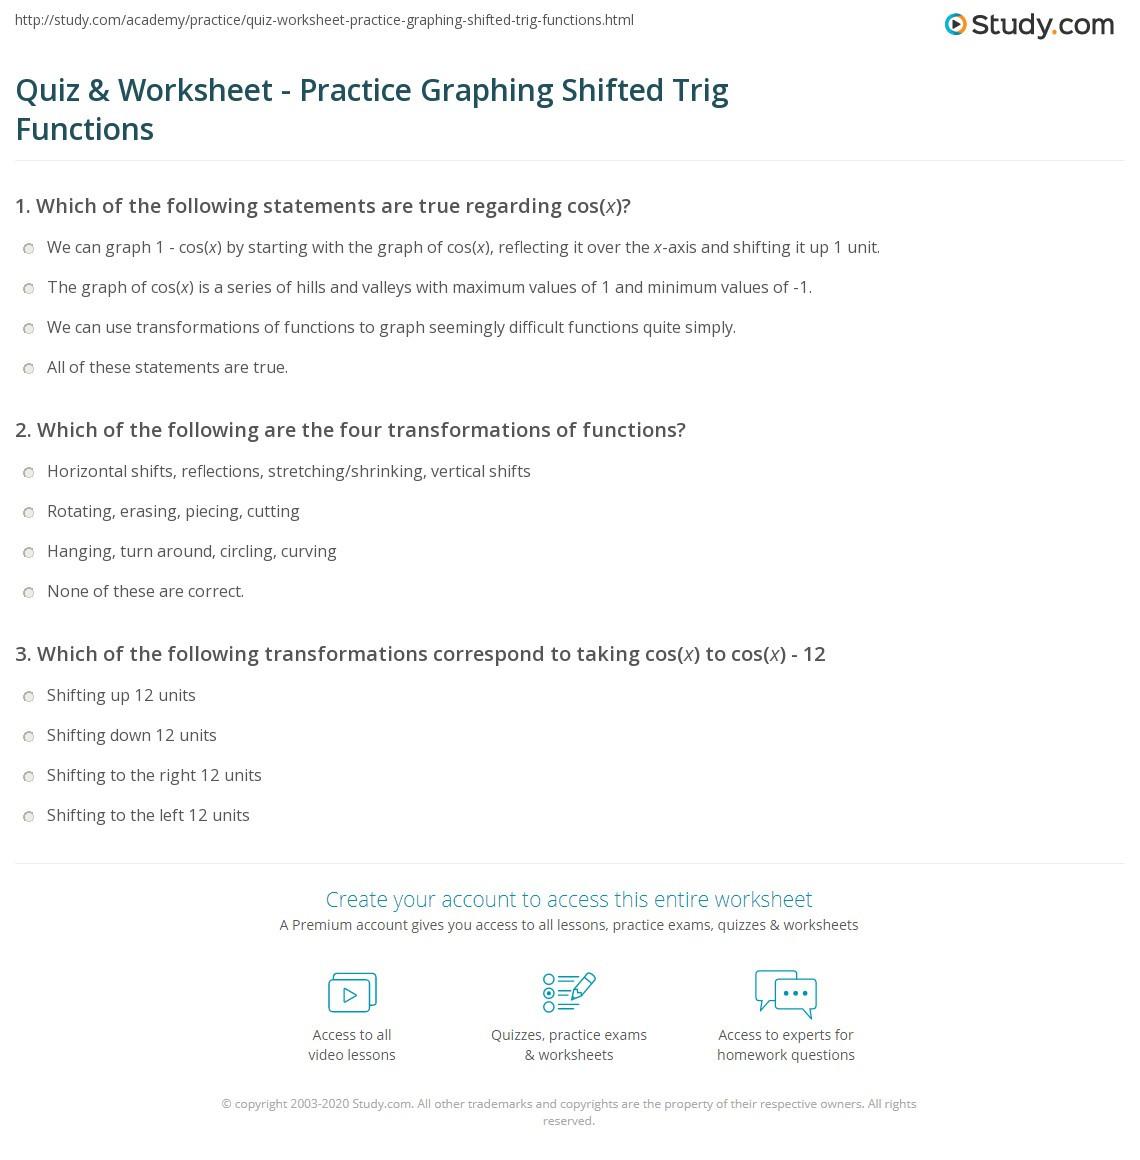 Graphing Trig Functions Practice Worksheet Quiz & Worksheet Practice Graphing Shifted Trig Functions